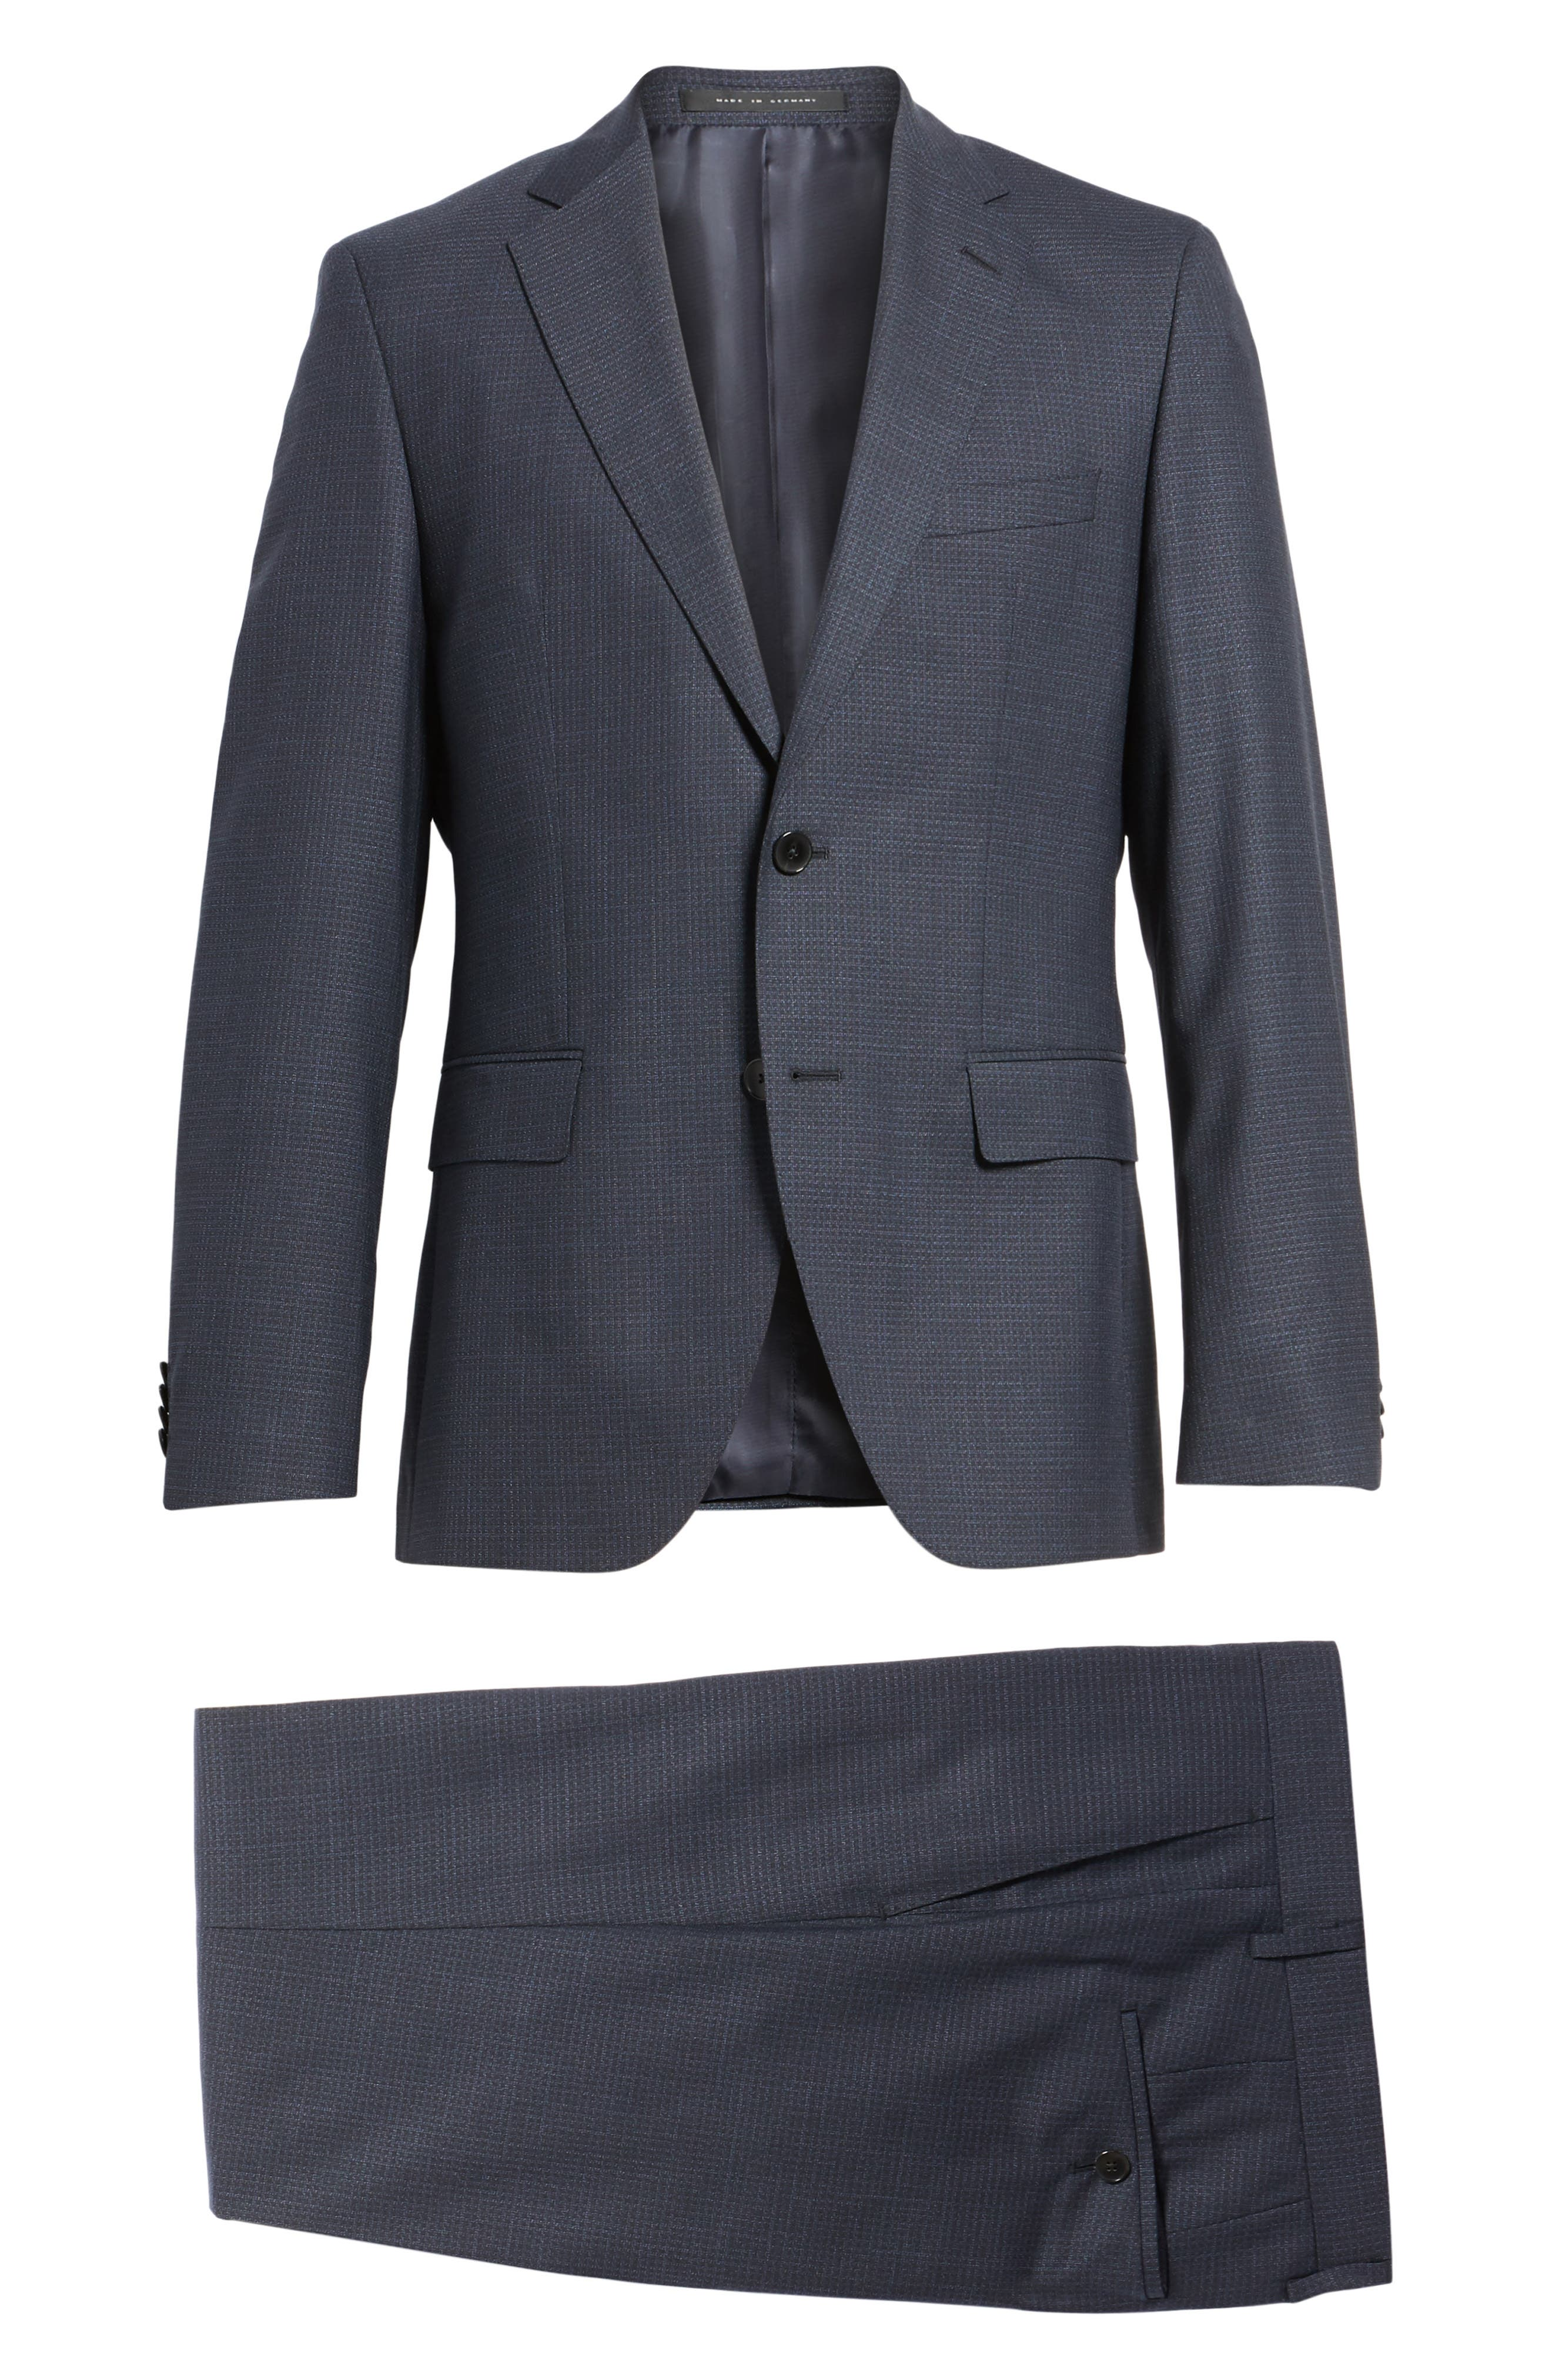 Johnstons/Lenon Classic Fit Check Wool Suit,                             Alternate thumbnail 8, color,                             409